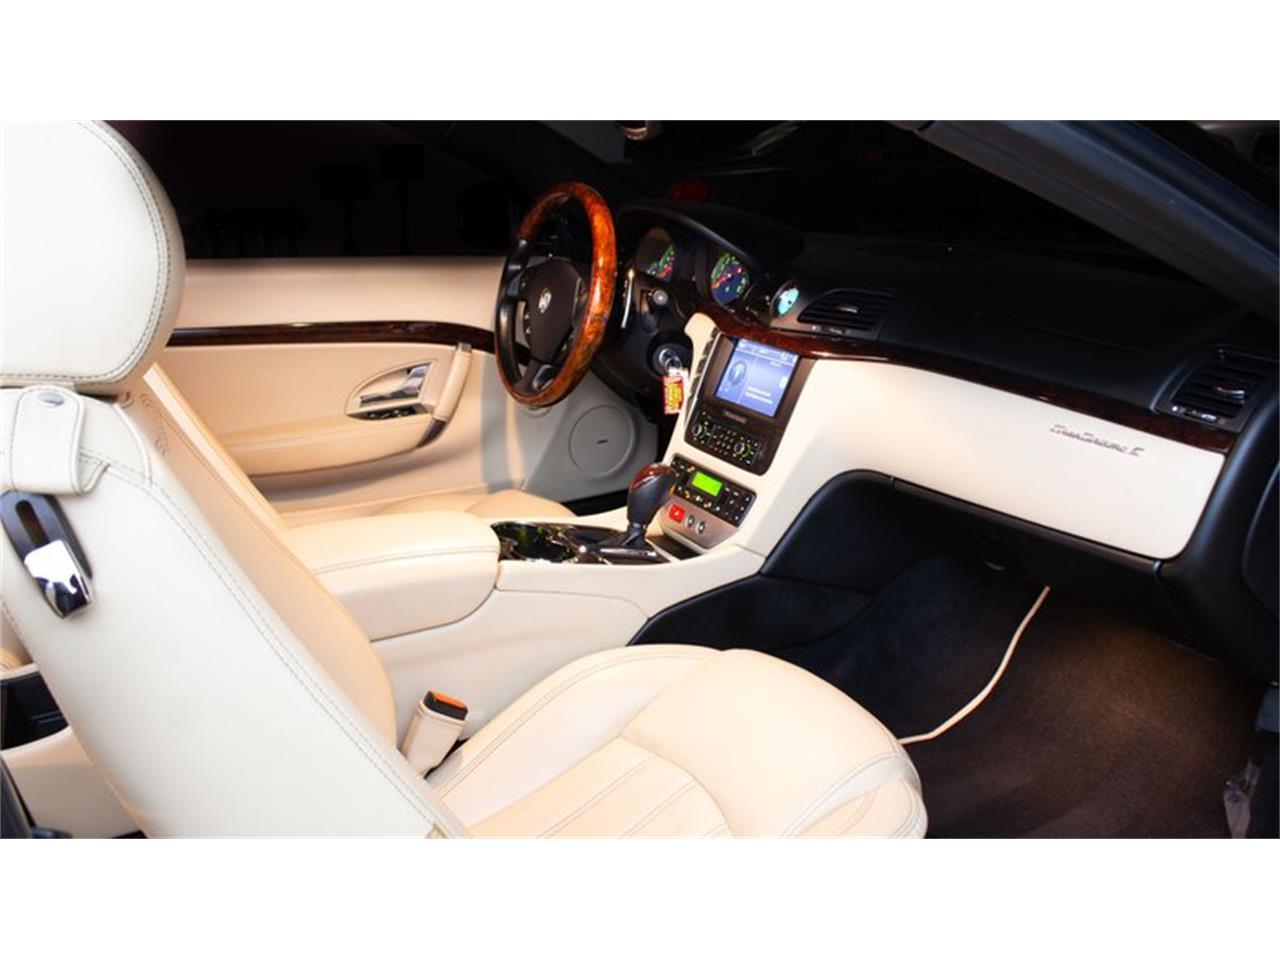 2011 Maserati GranTurismo (CC-1334771) for sale in Rockville, Maryland